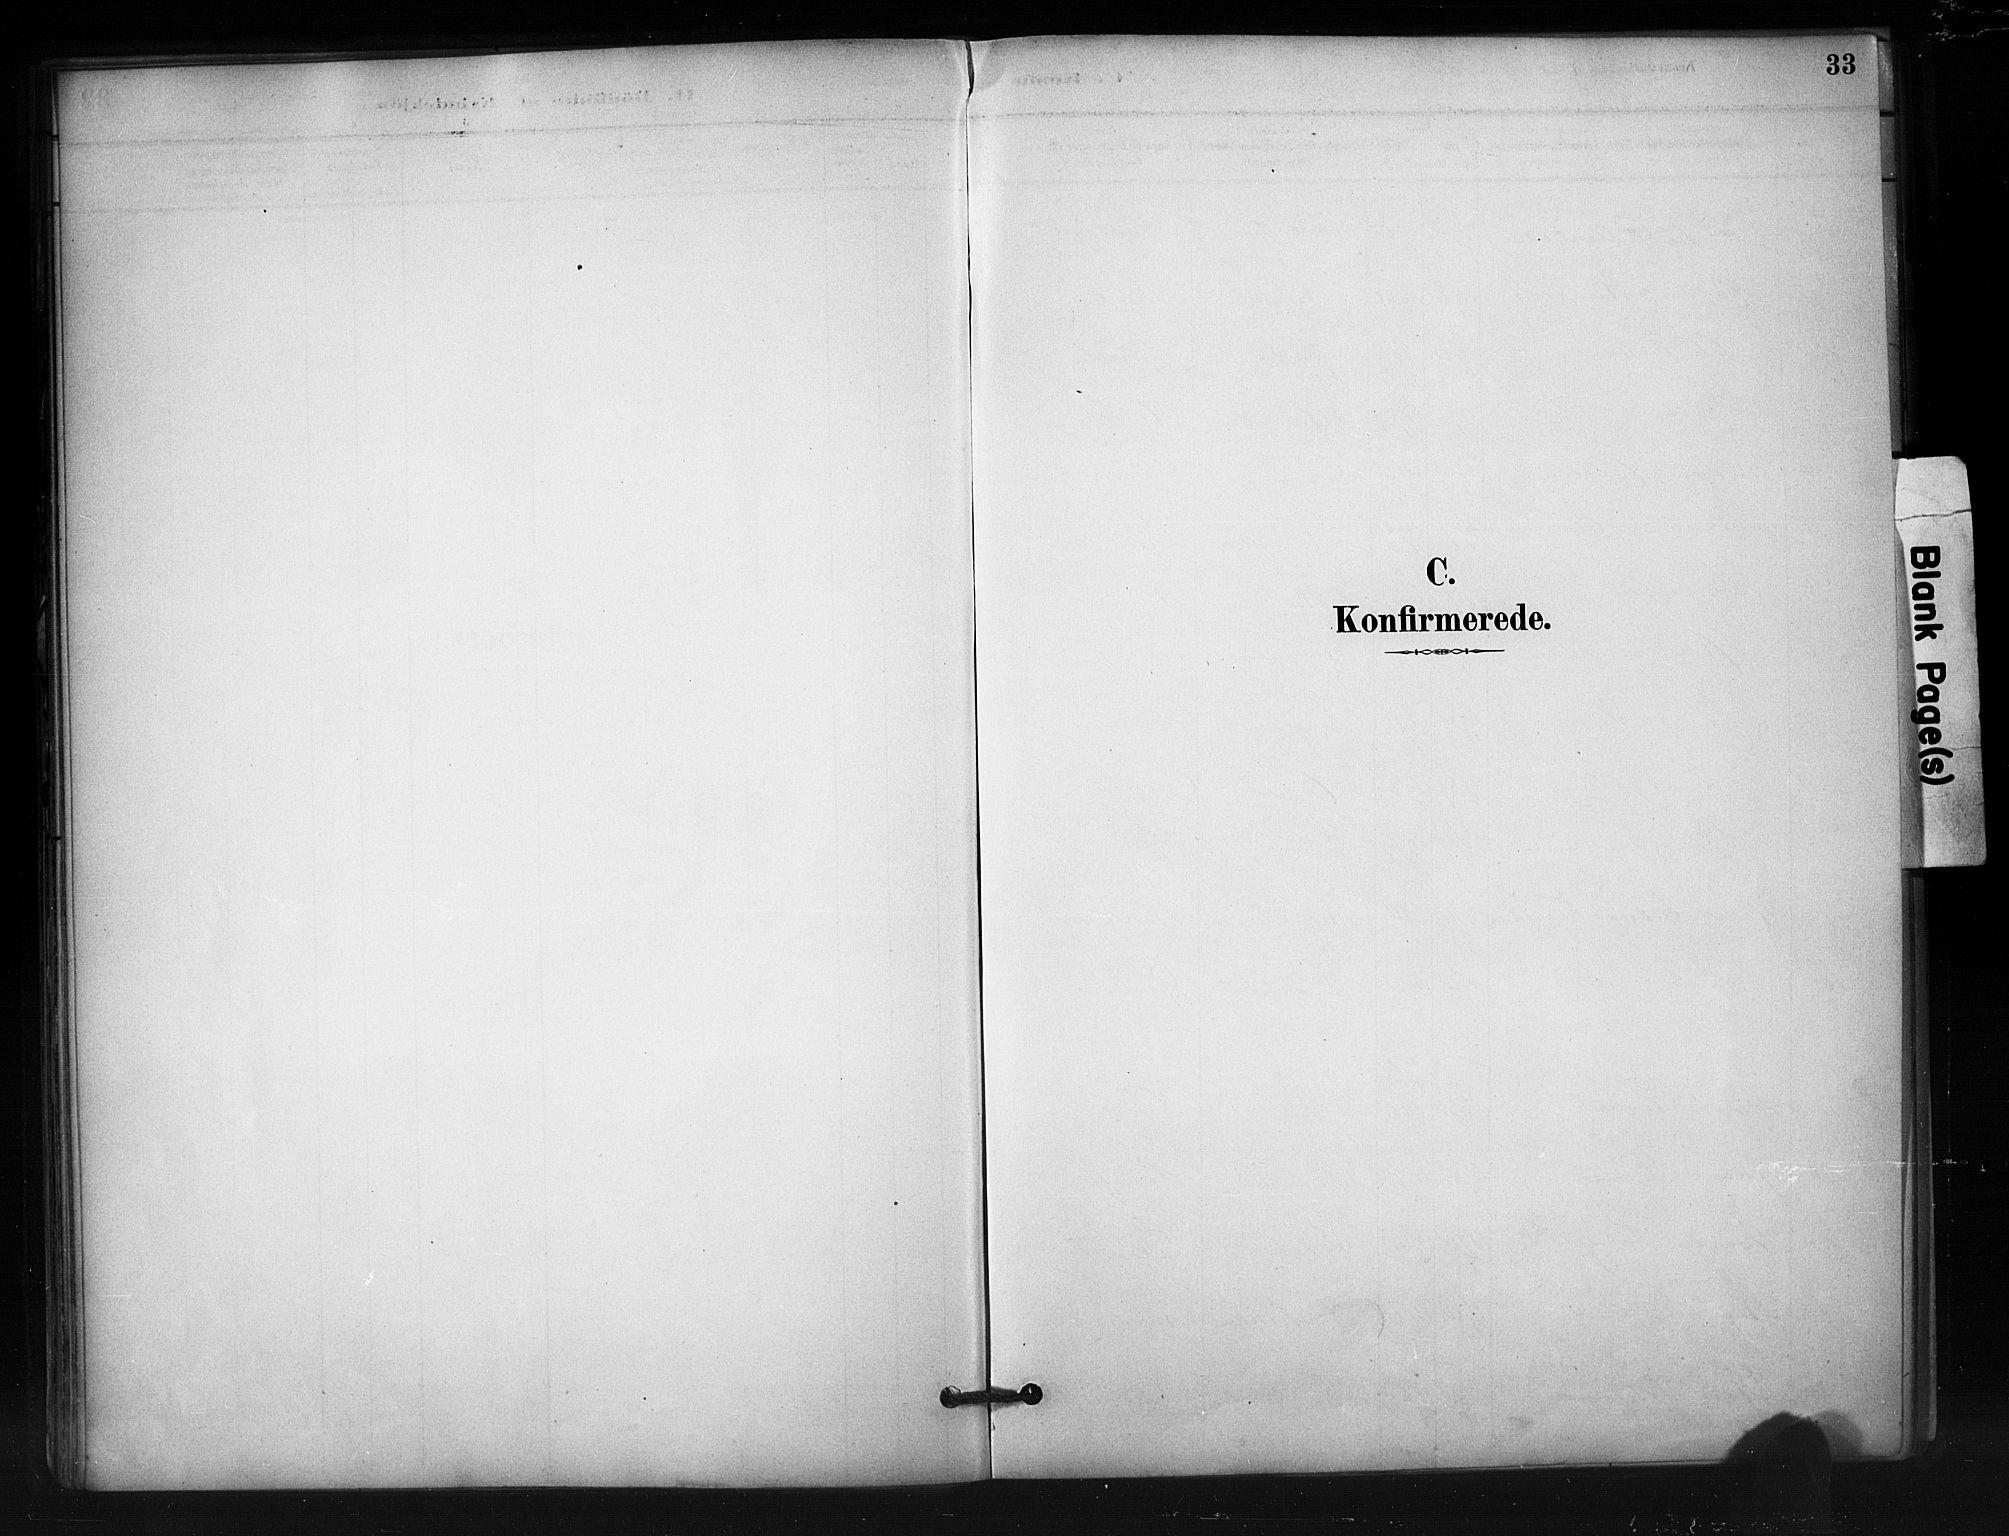 SAH, Nord-Aurdal prestekontor, Ministerialbok nr. 12, 1883-1895, s. 33